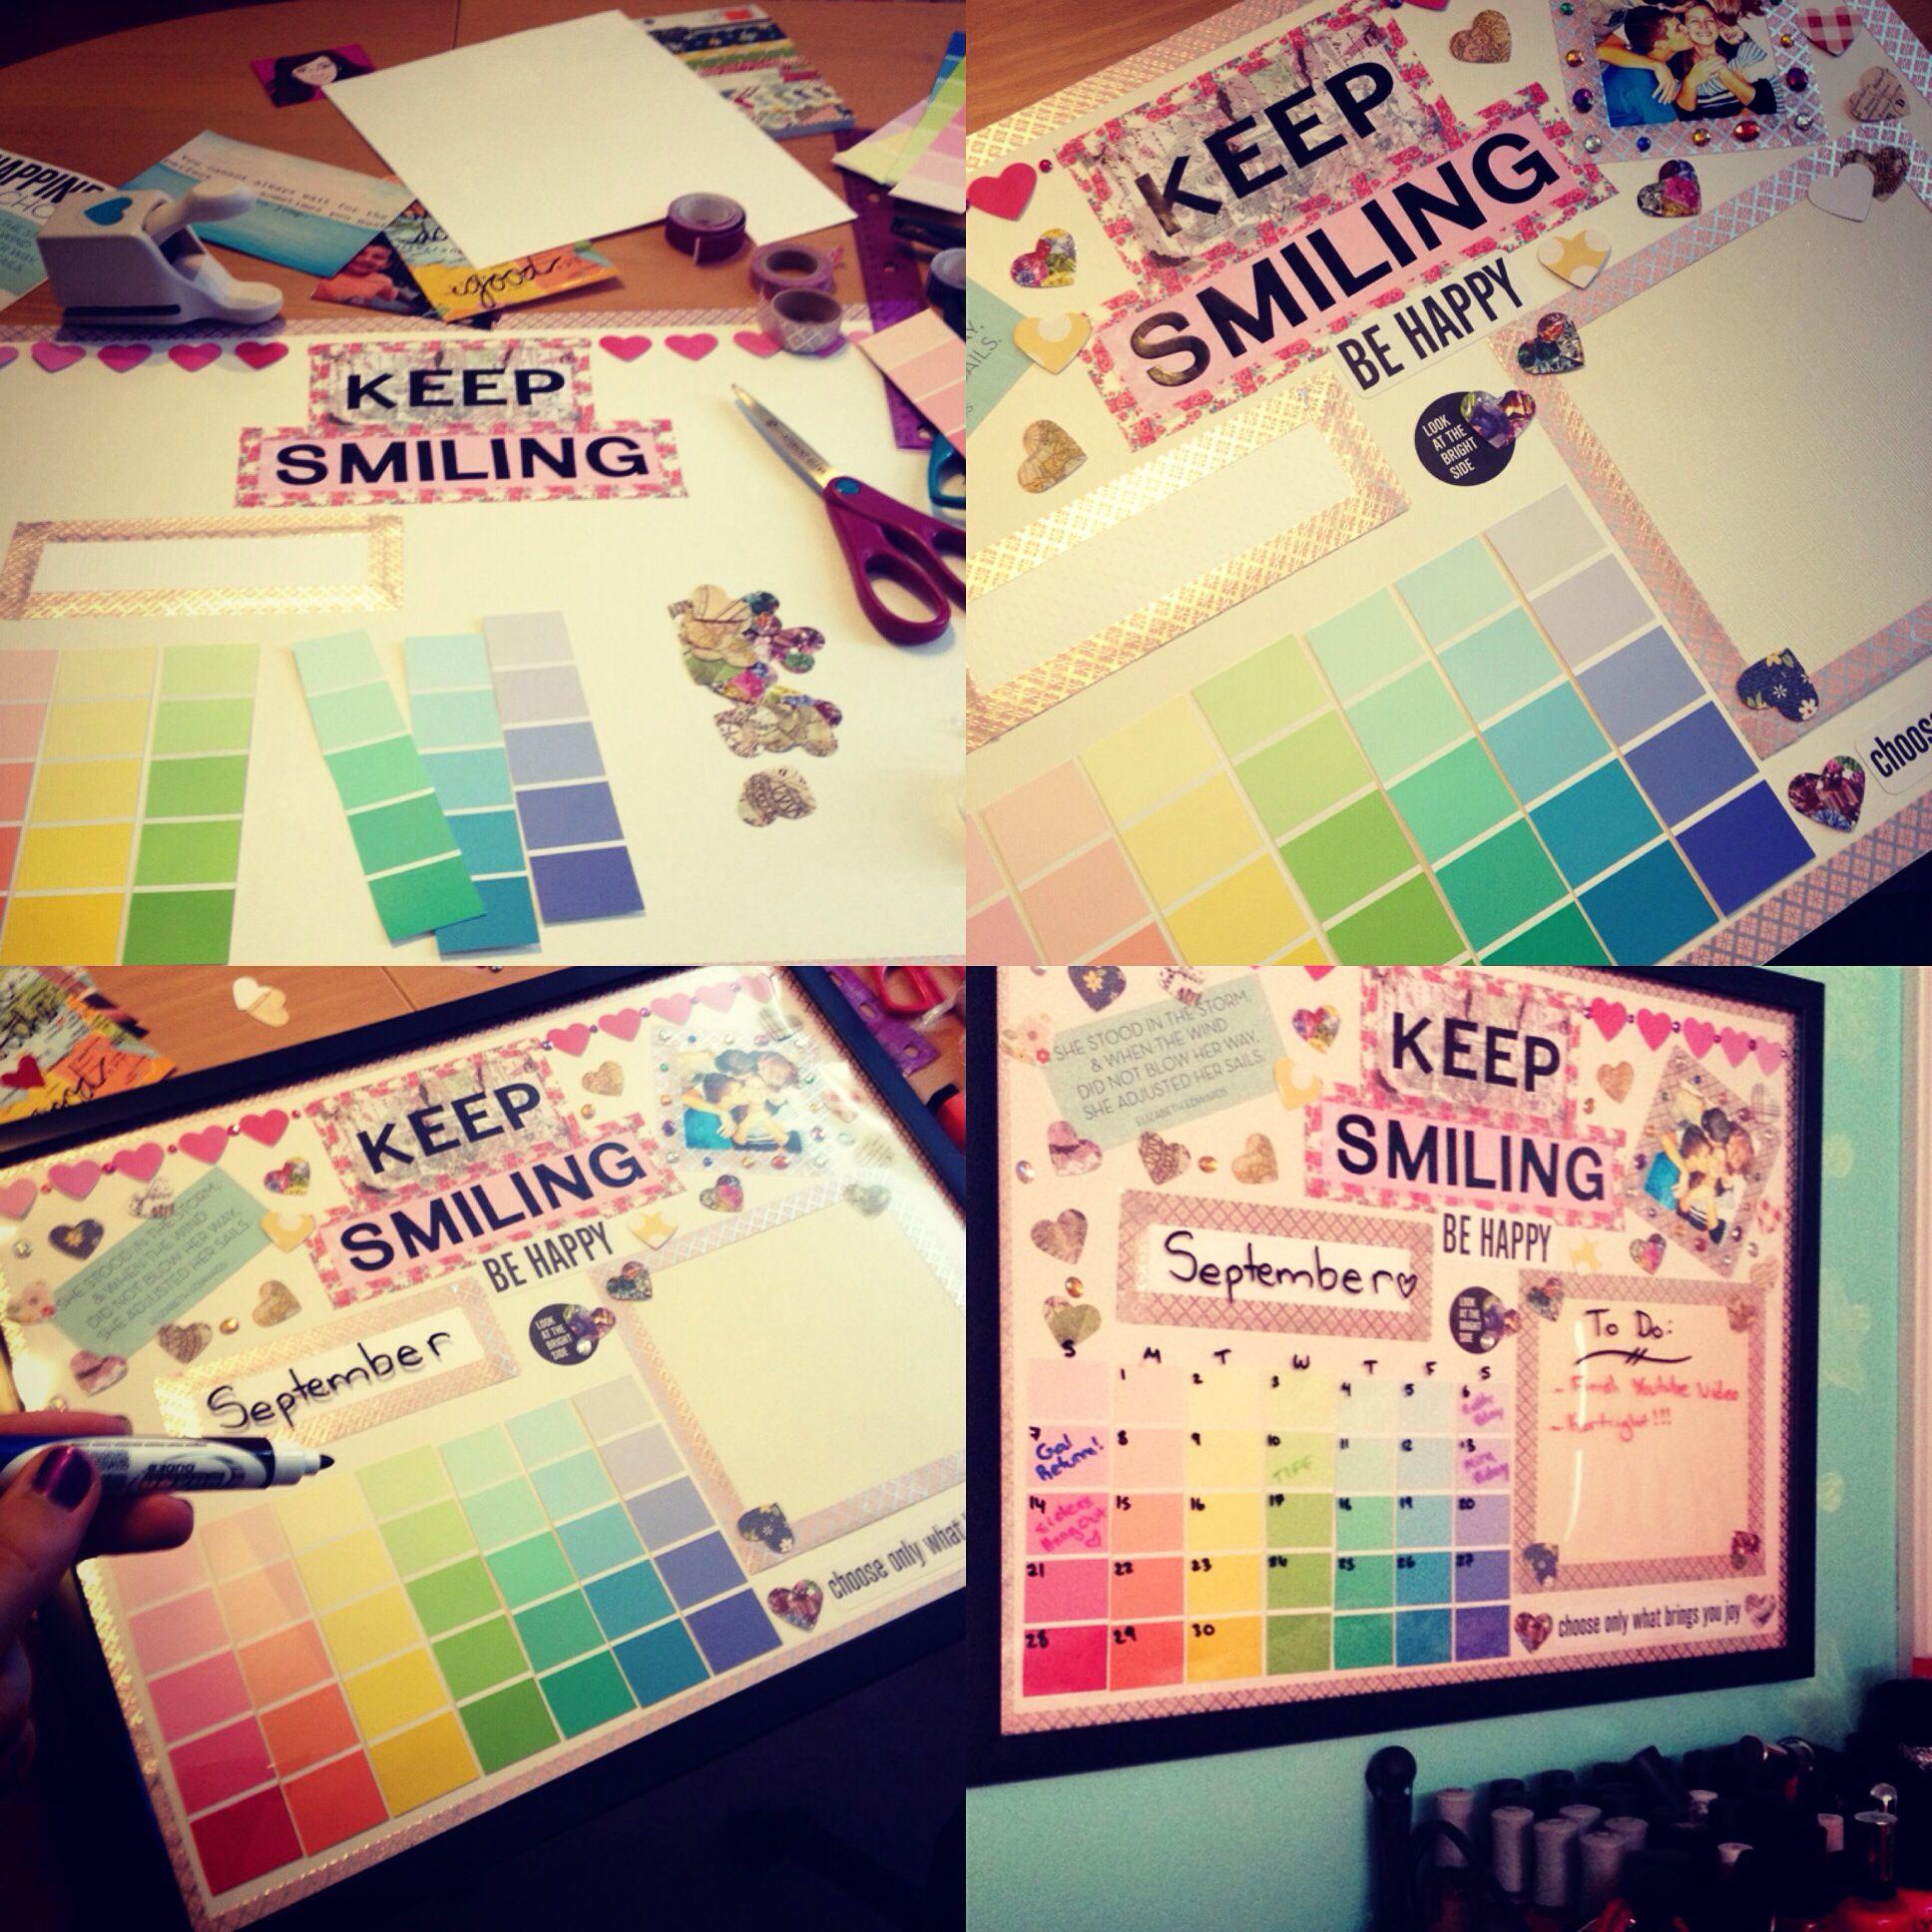 Diy Calendar Laurdiy : Dry erase custom wall calendar made with paint chips and